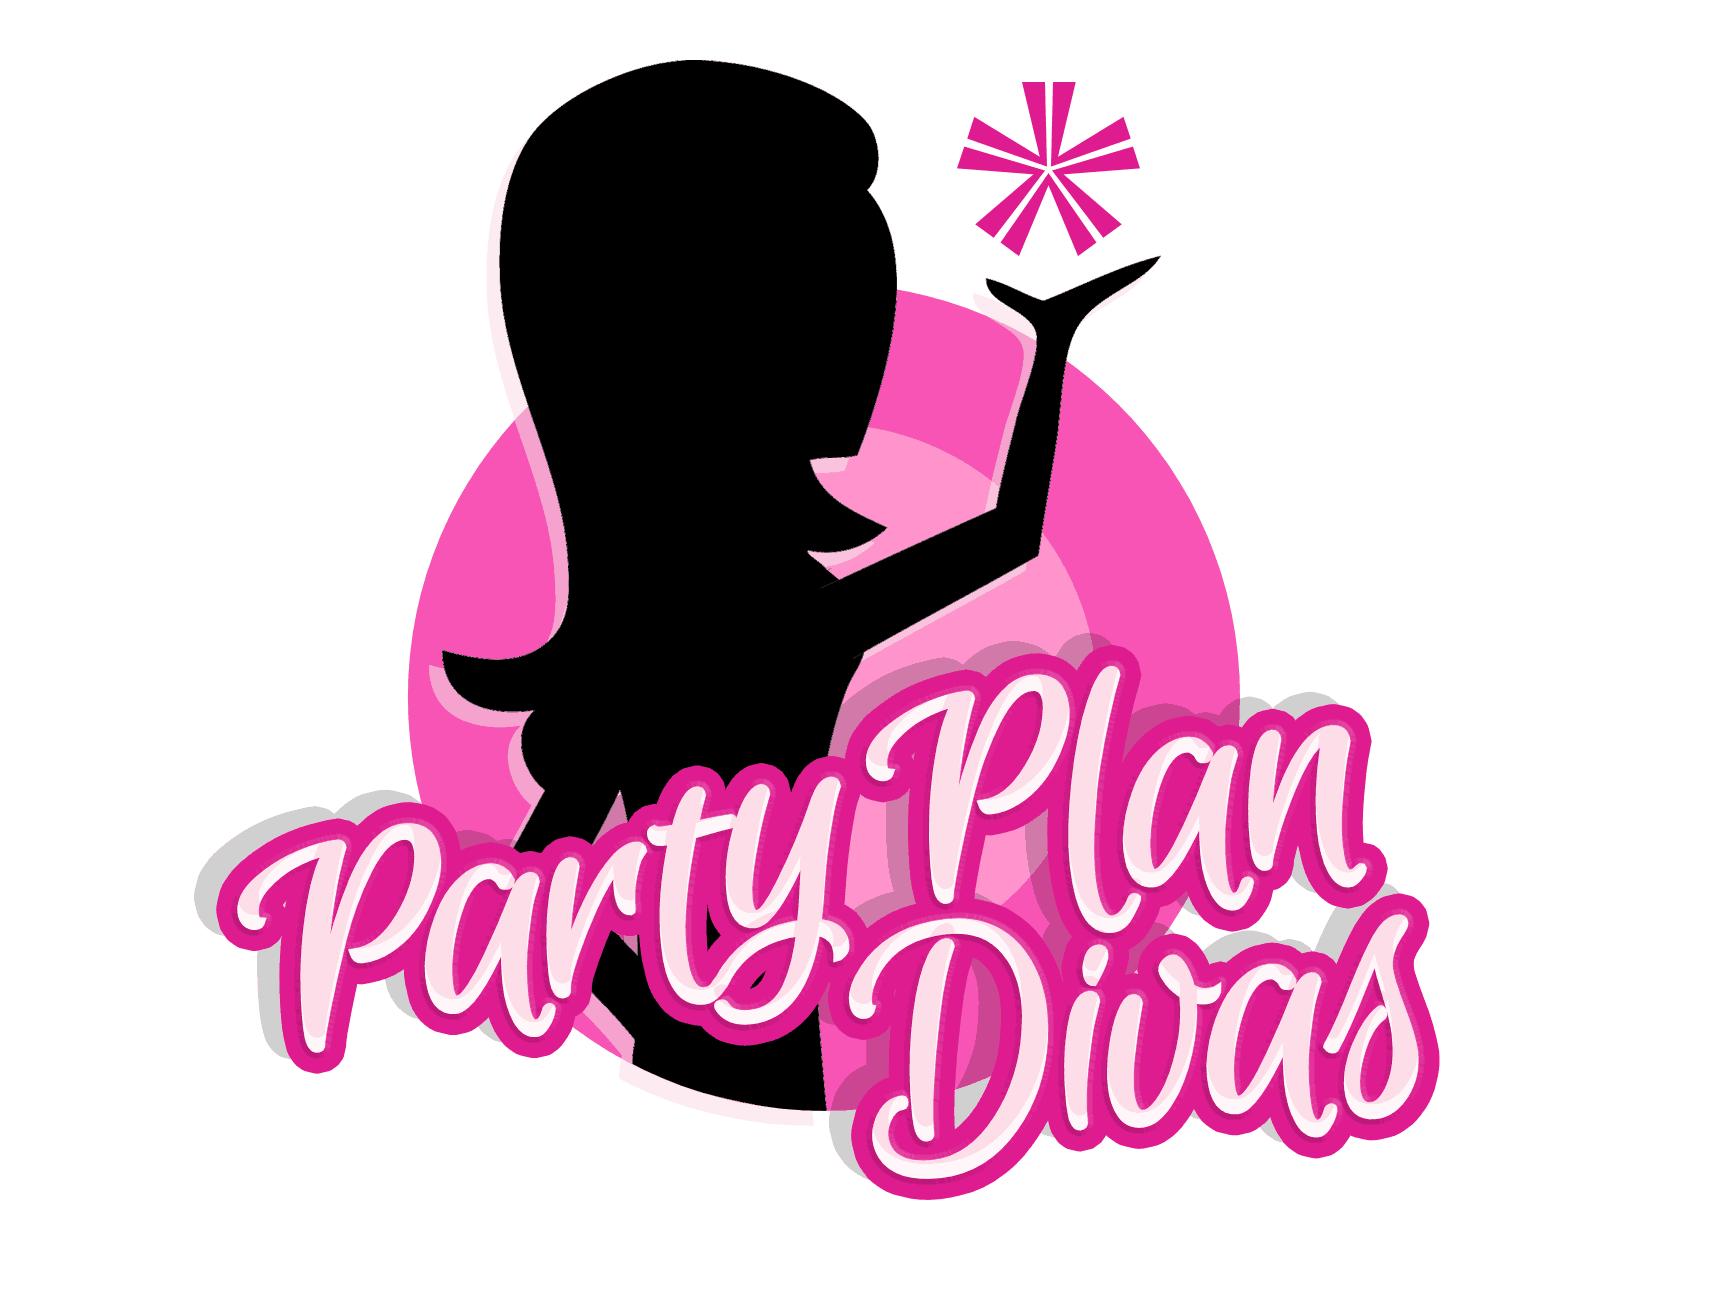 partyplandivas